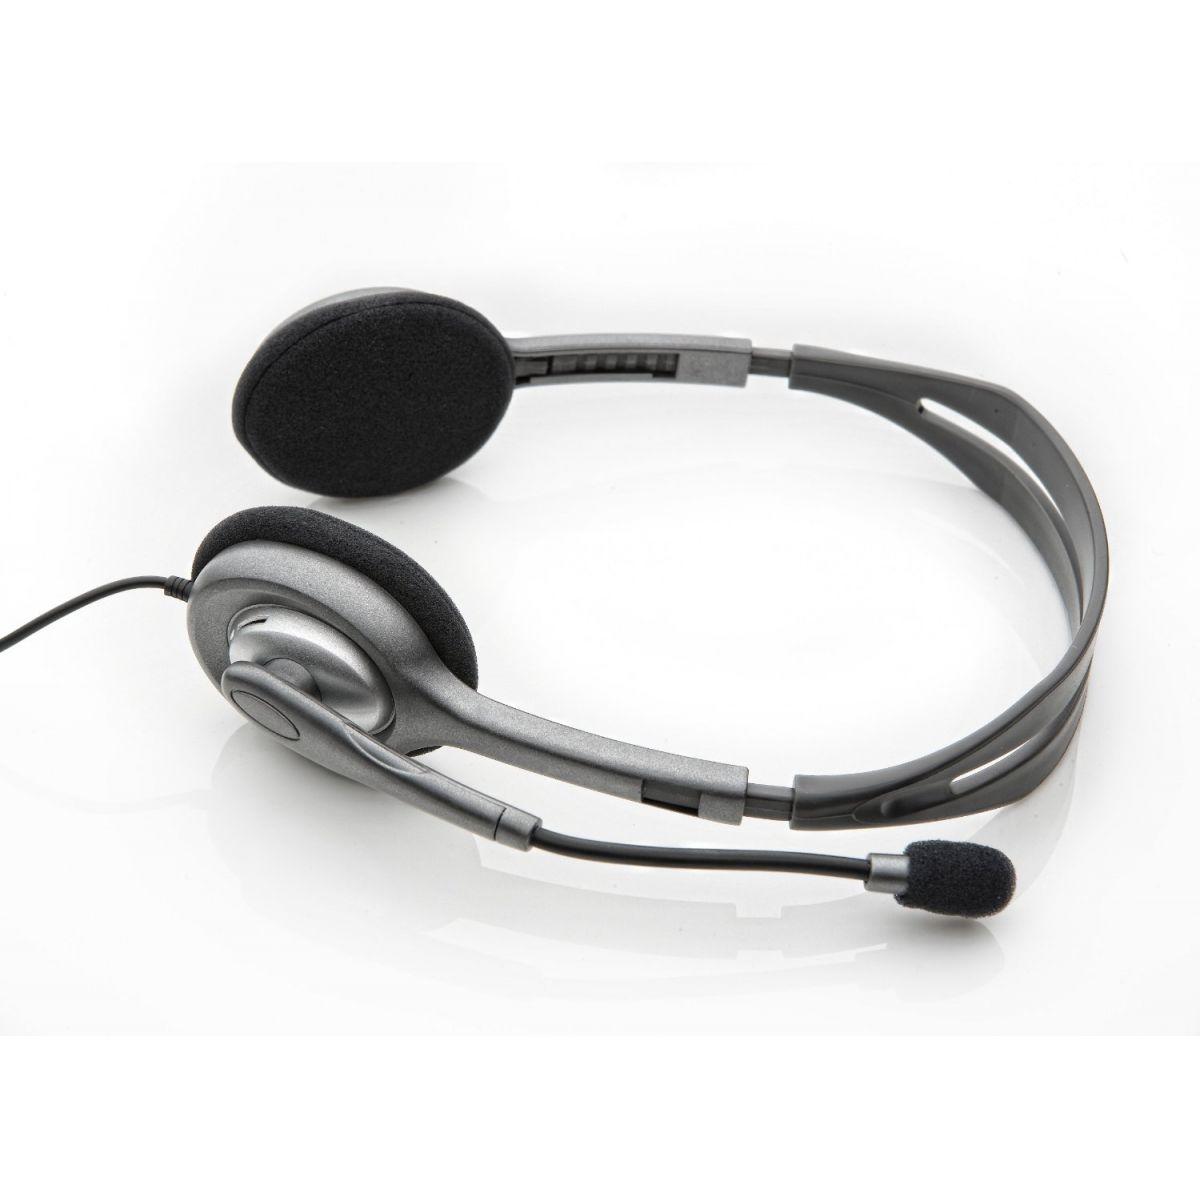 Fone de Ouvido com Microfone H110 981-000305 - Logitech